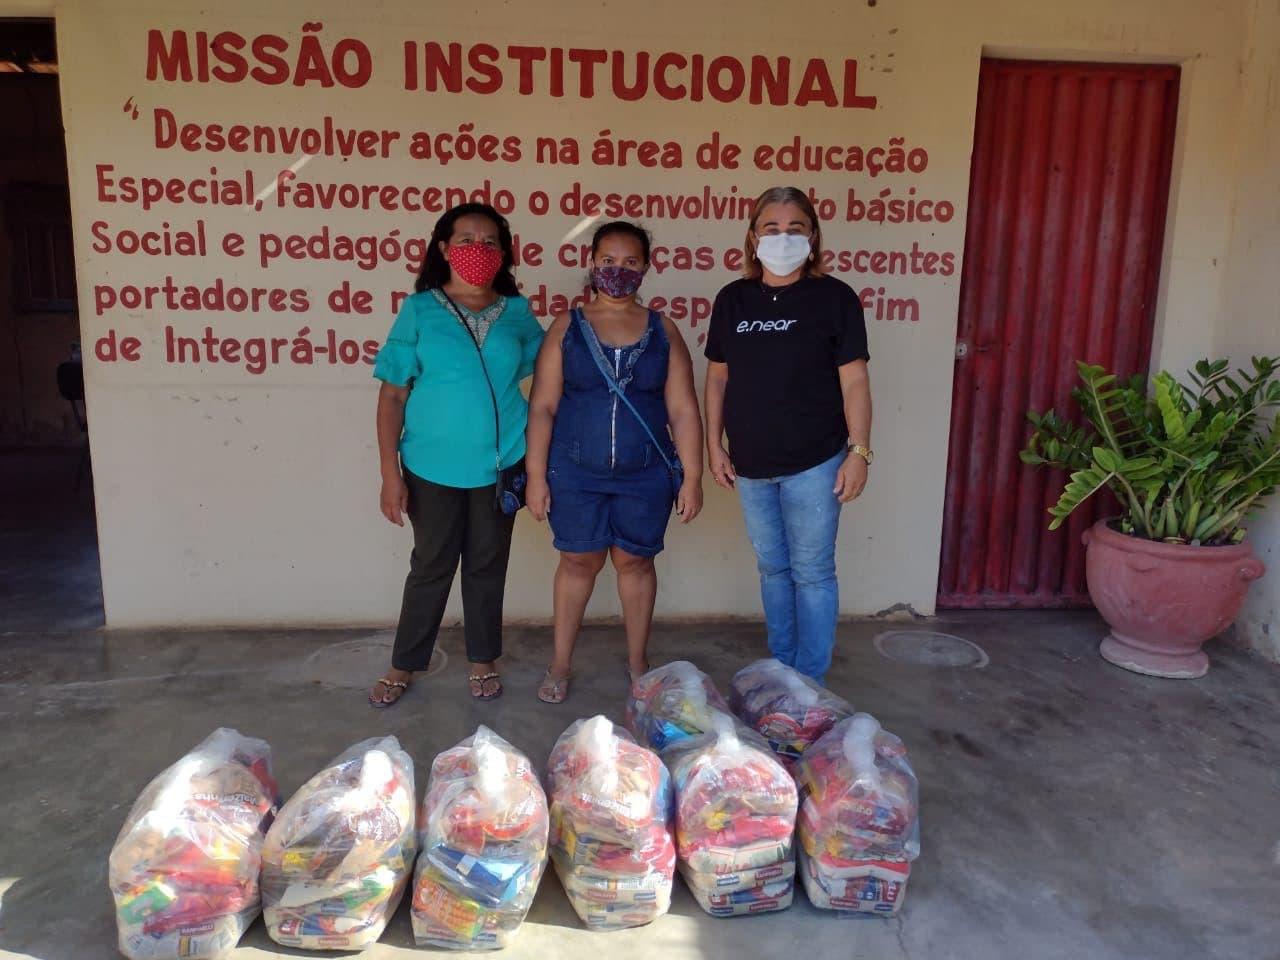 e.near - food baskets offer - Pestalozzi Association Milagres (6)